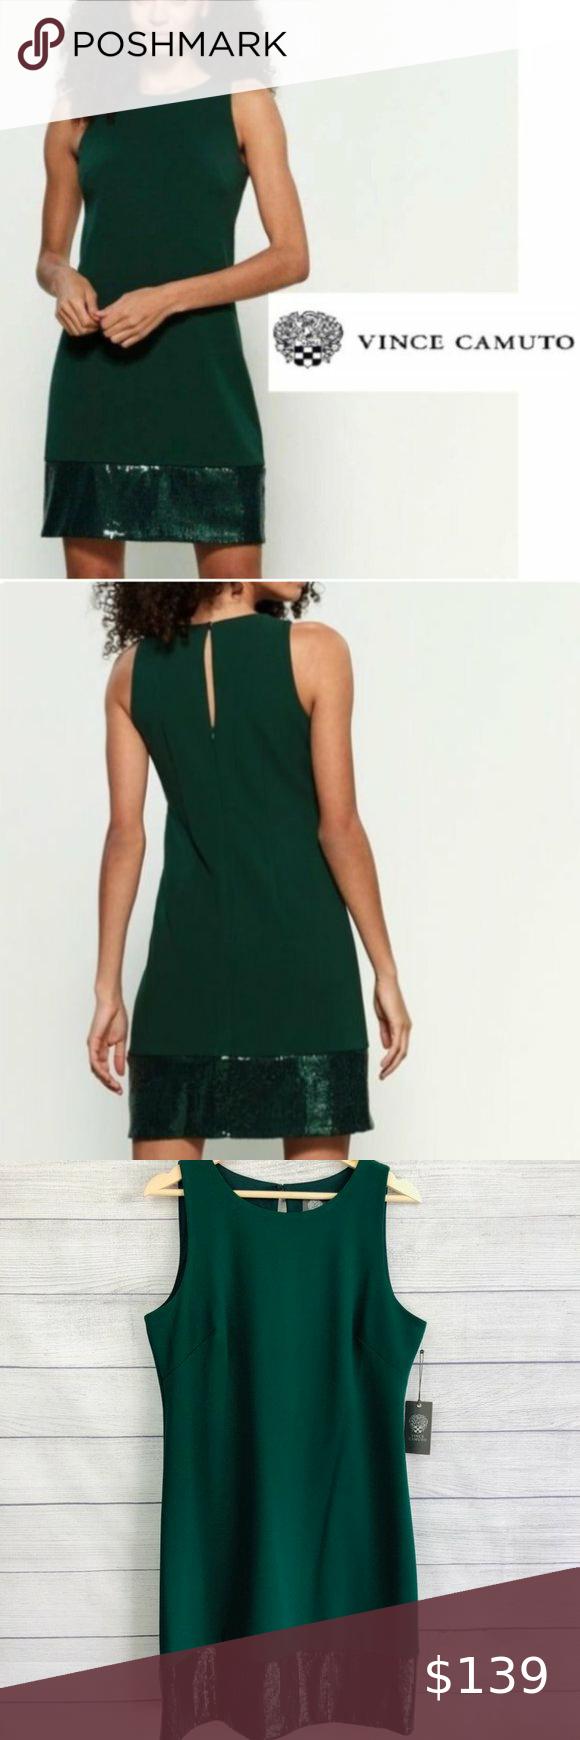 Vince Camuto Hunter Green Sequin Sleeveless Dress Green Sequins Sleeveless Dress Clothes Design [ 1740 x 580 Pixel ]